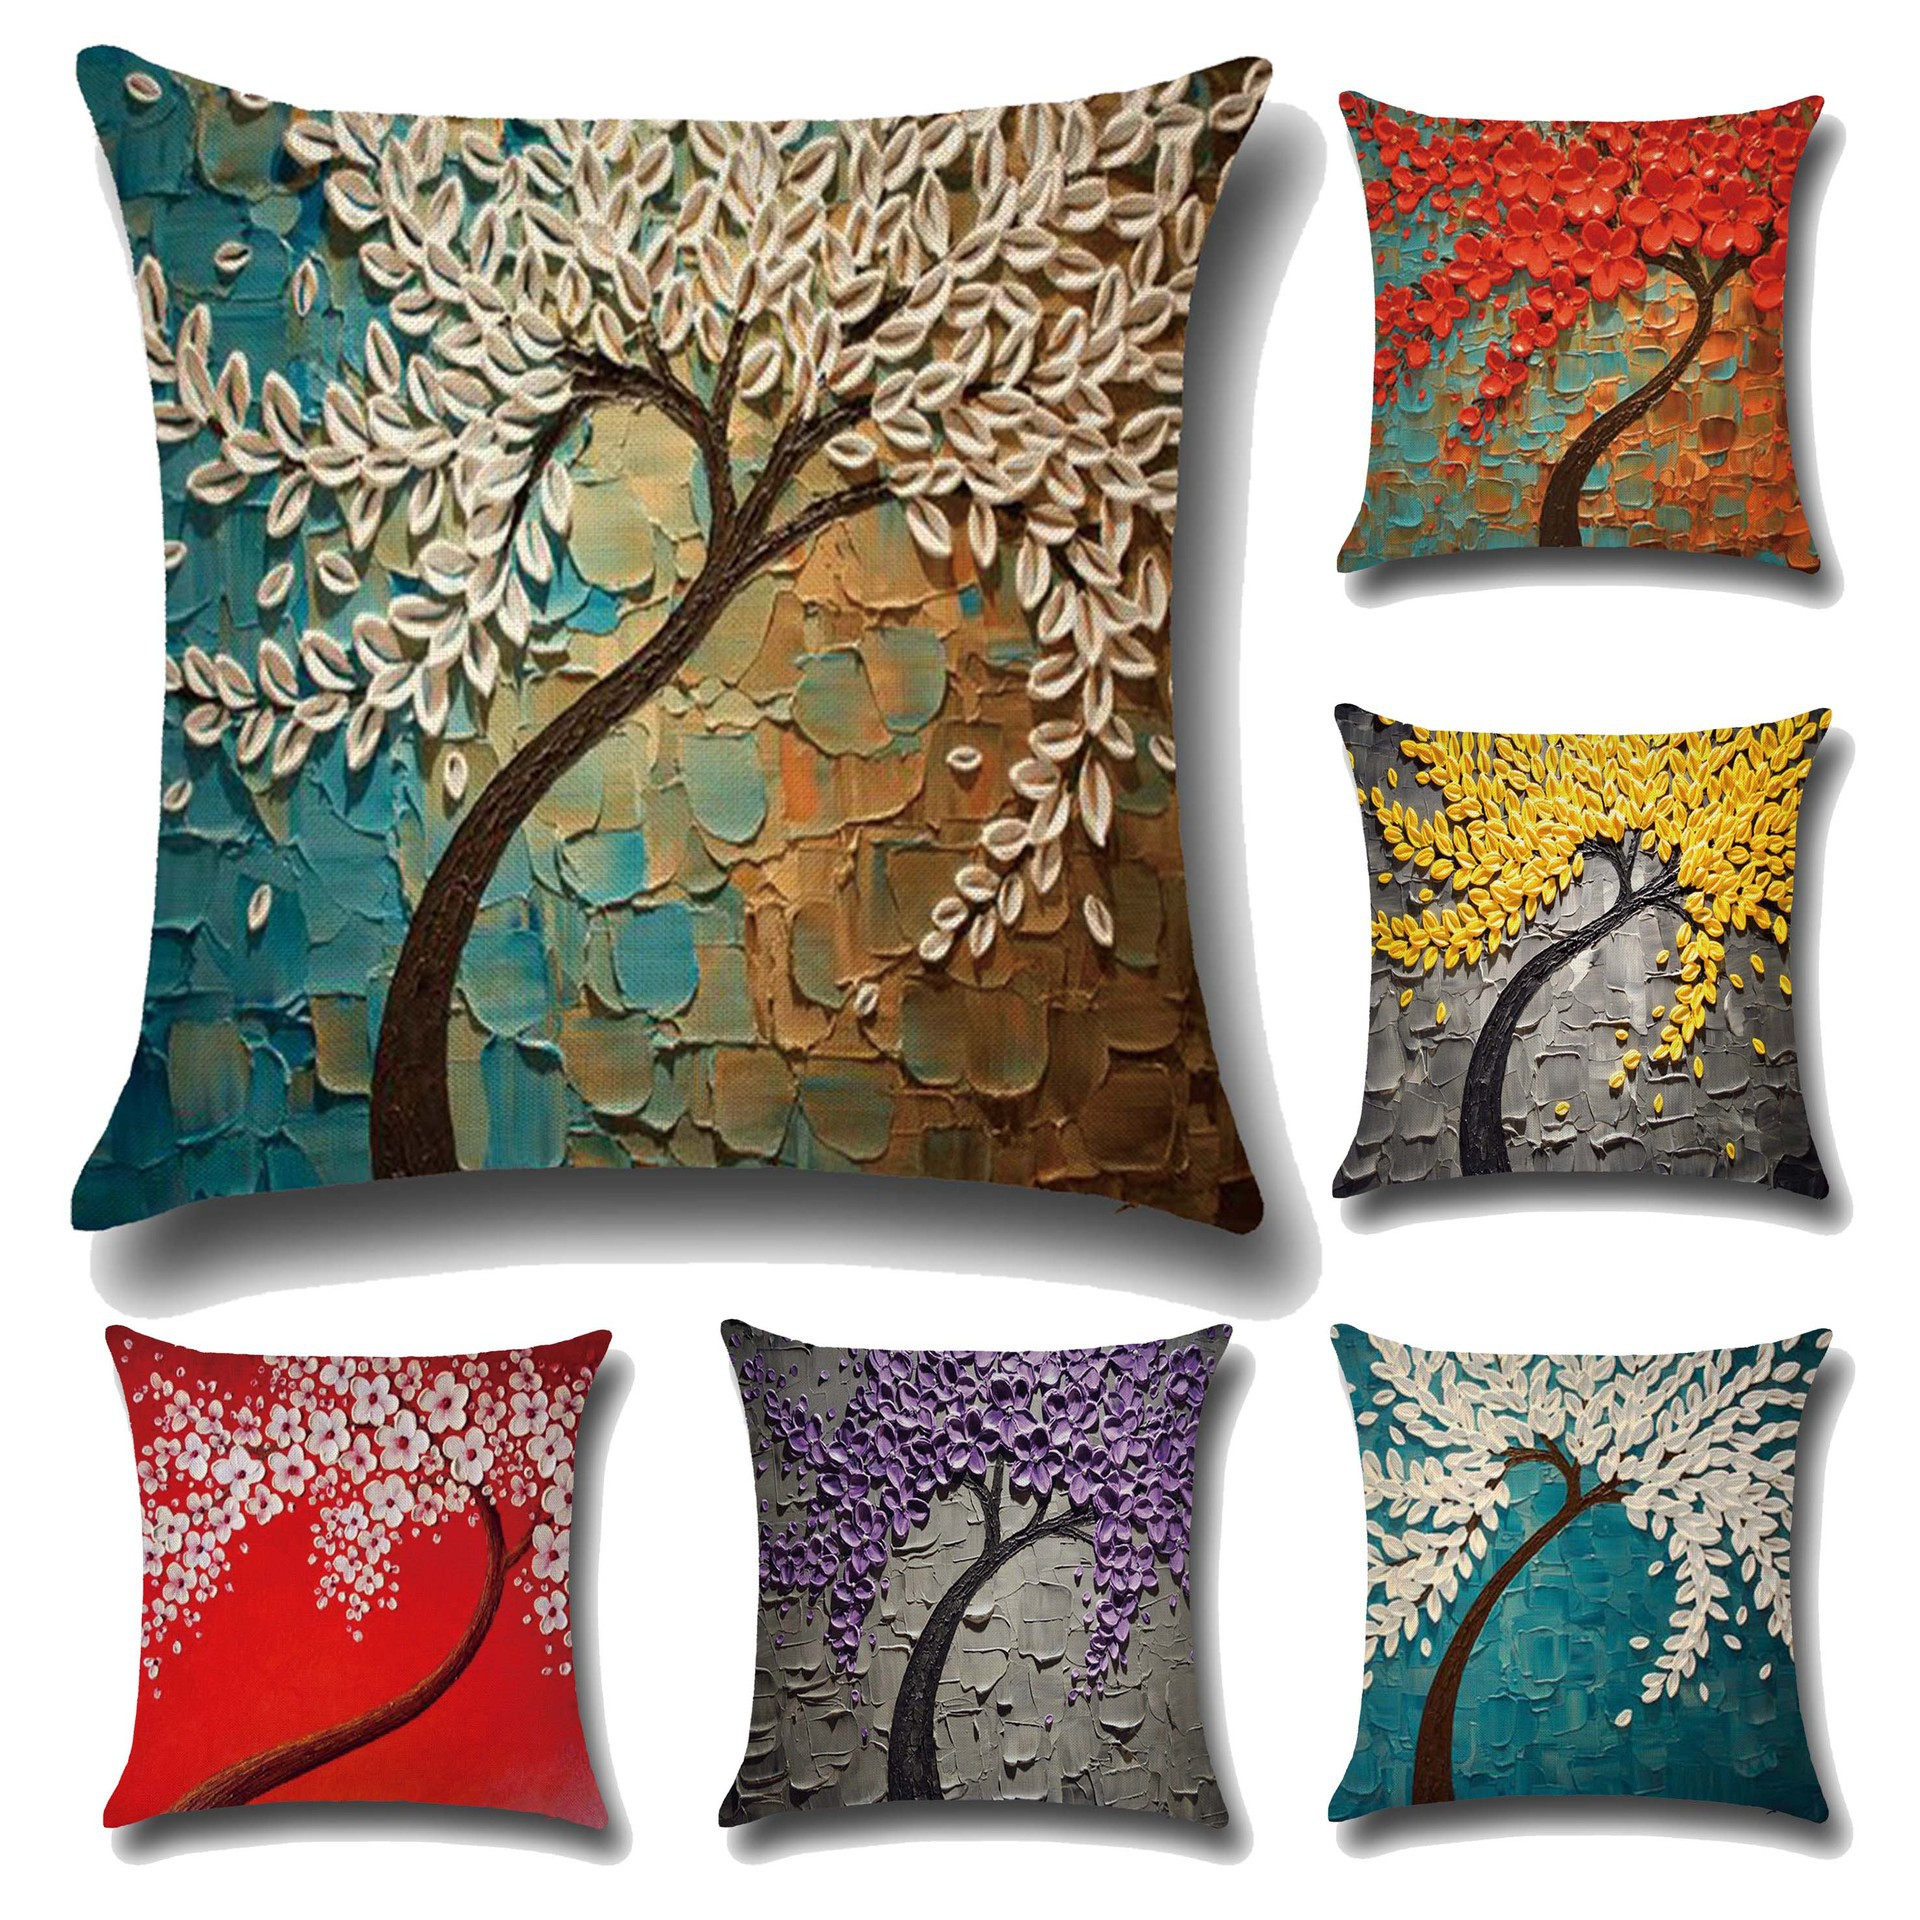 45*45cm 3D Oil Painting Printing Linen Fabric Pillowcase Pillows Case Cover Pillow Bedroom Pillowcase